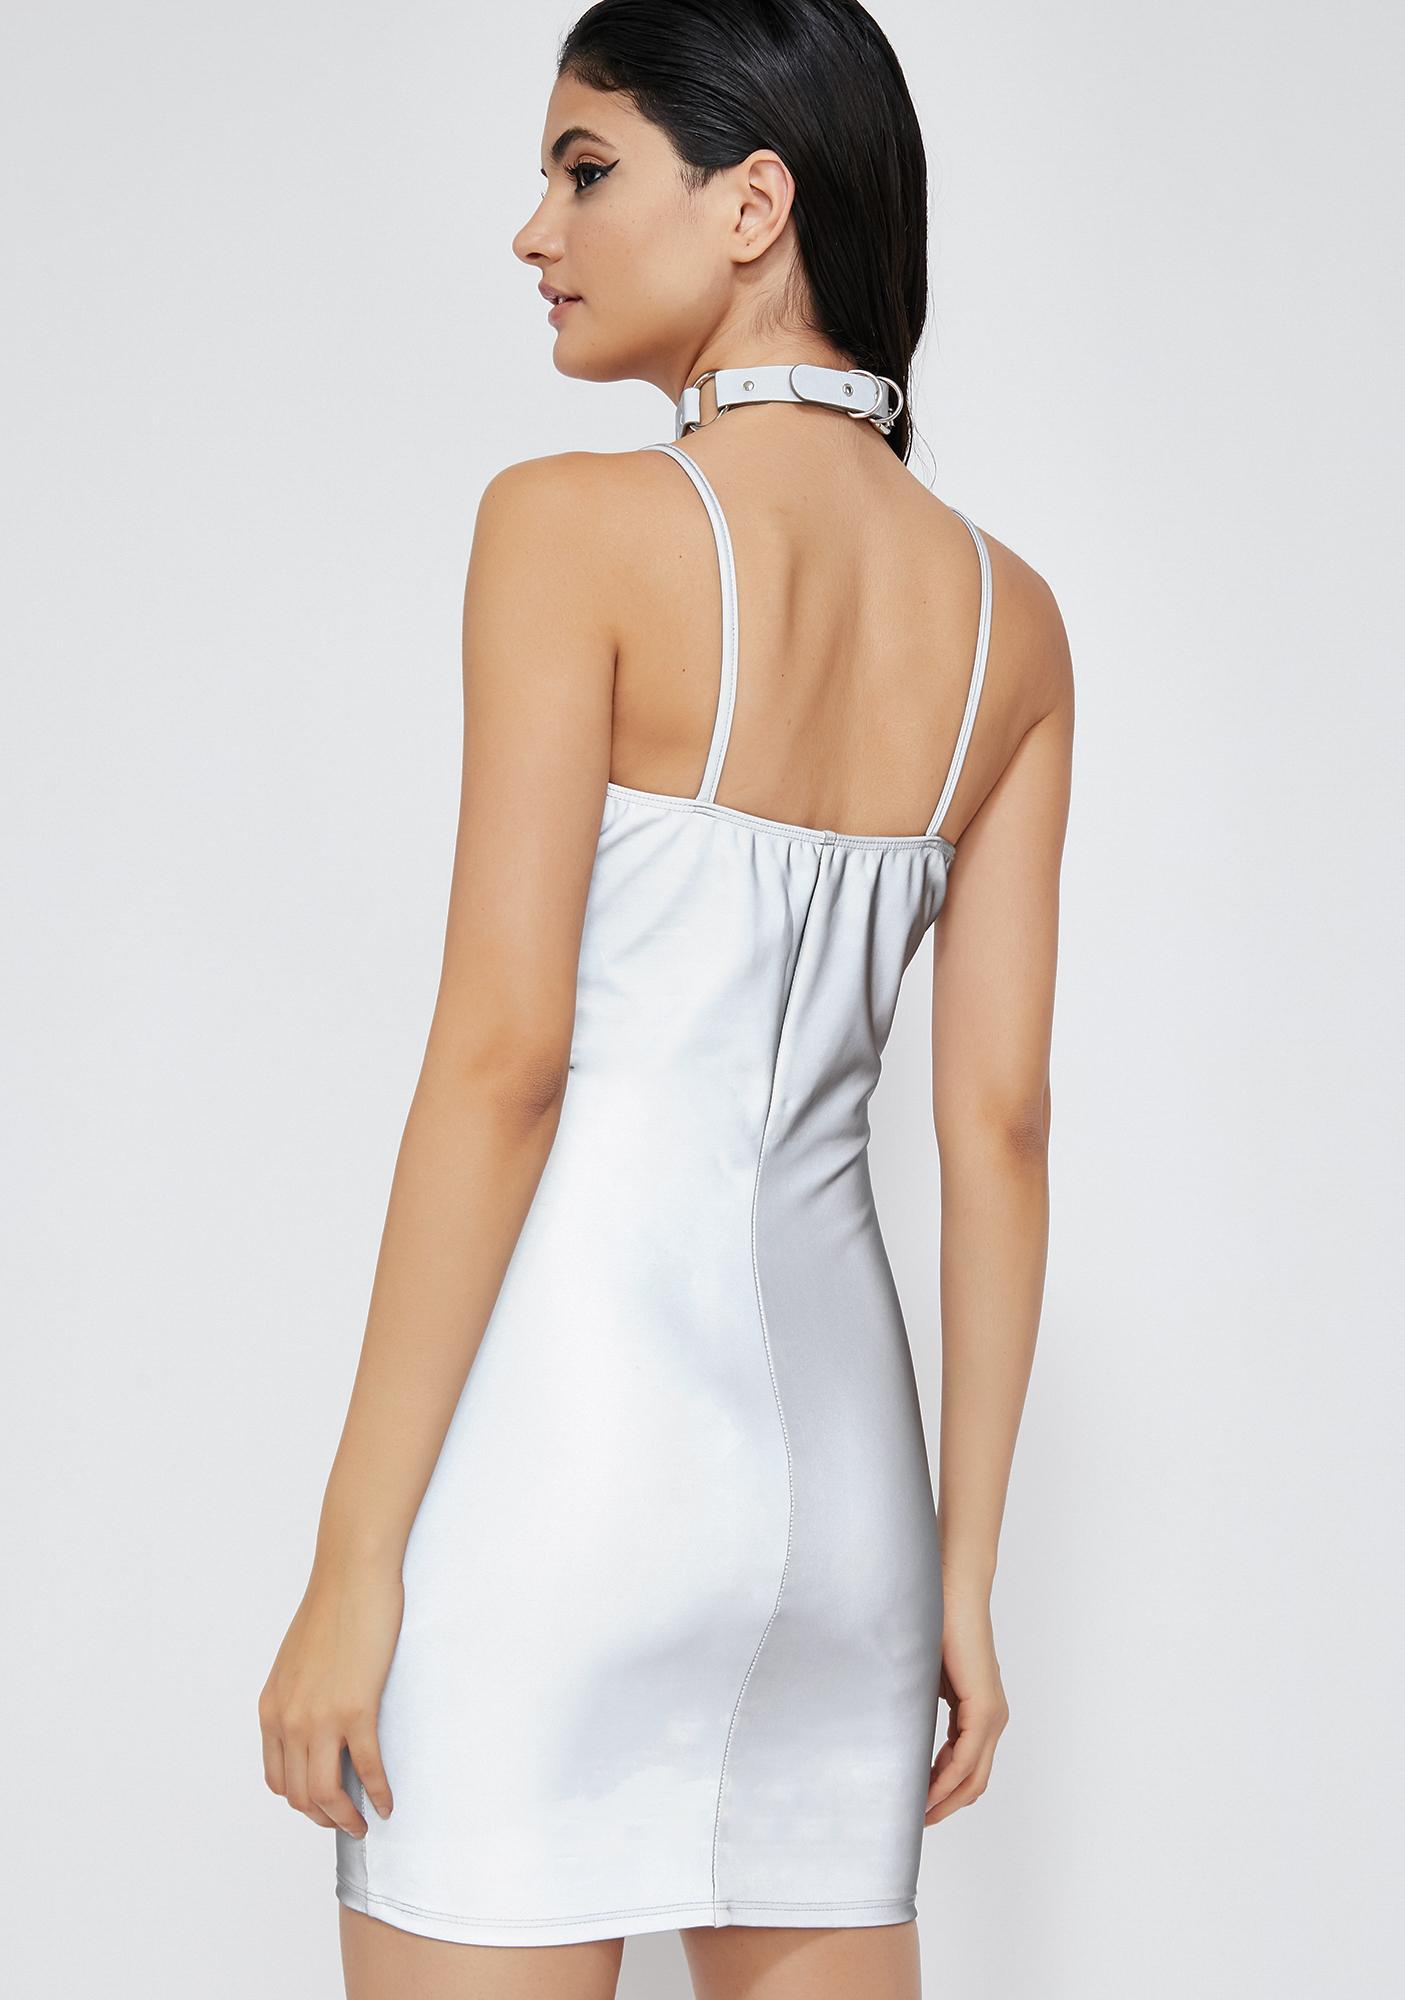 Thirstmaker Reflective Dress